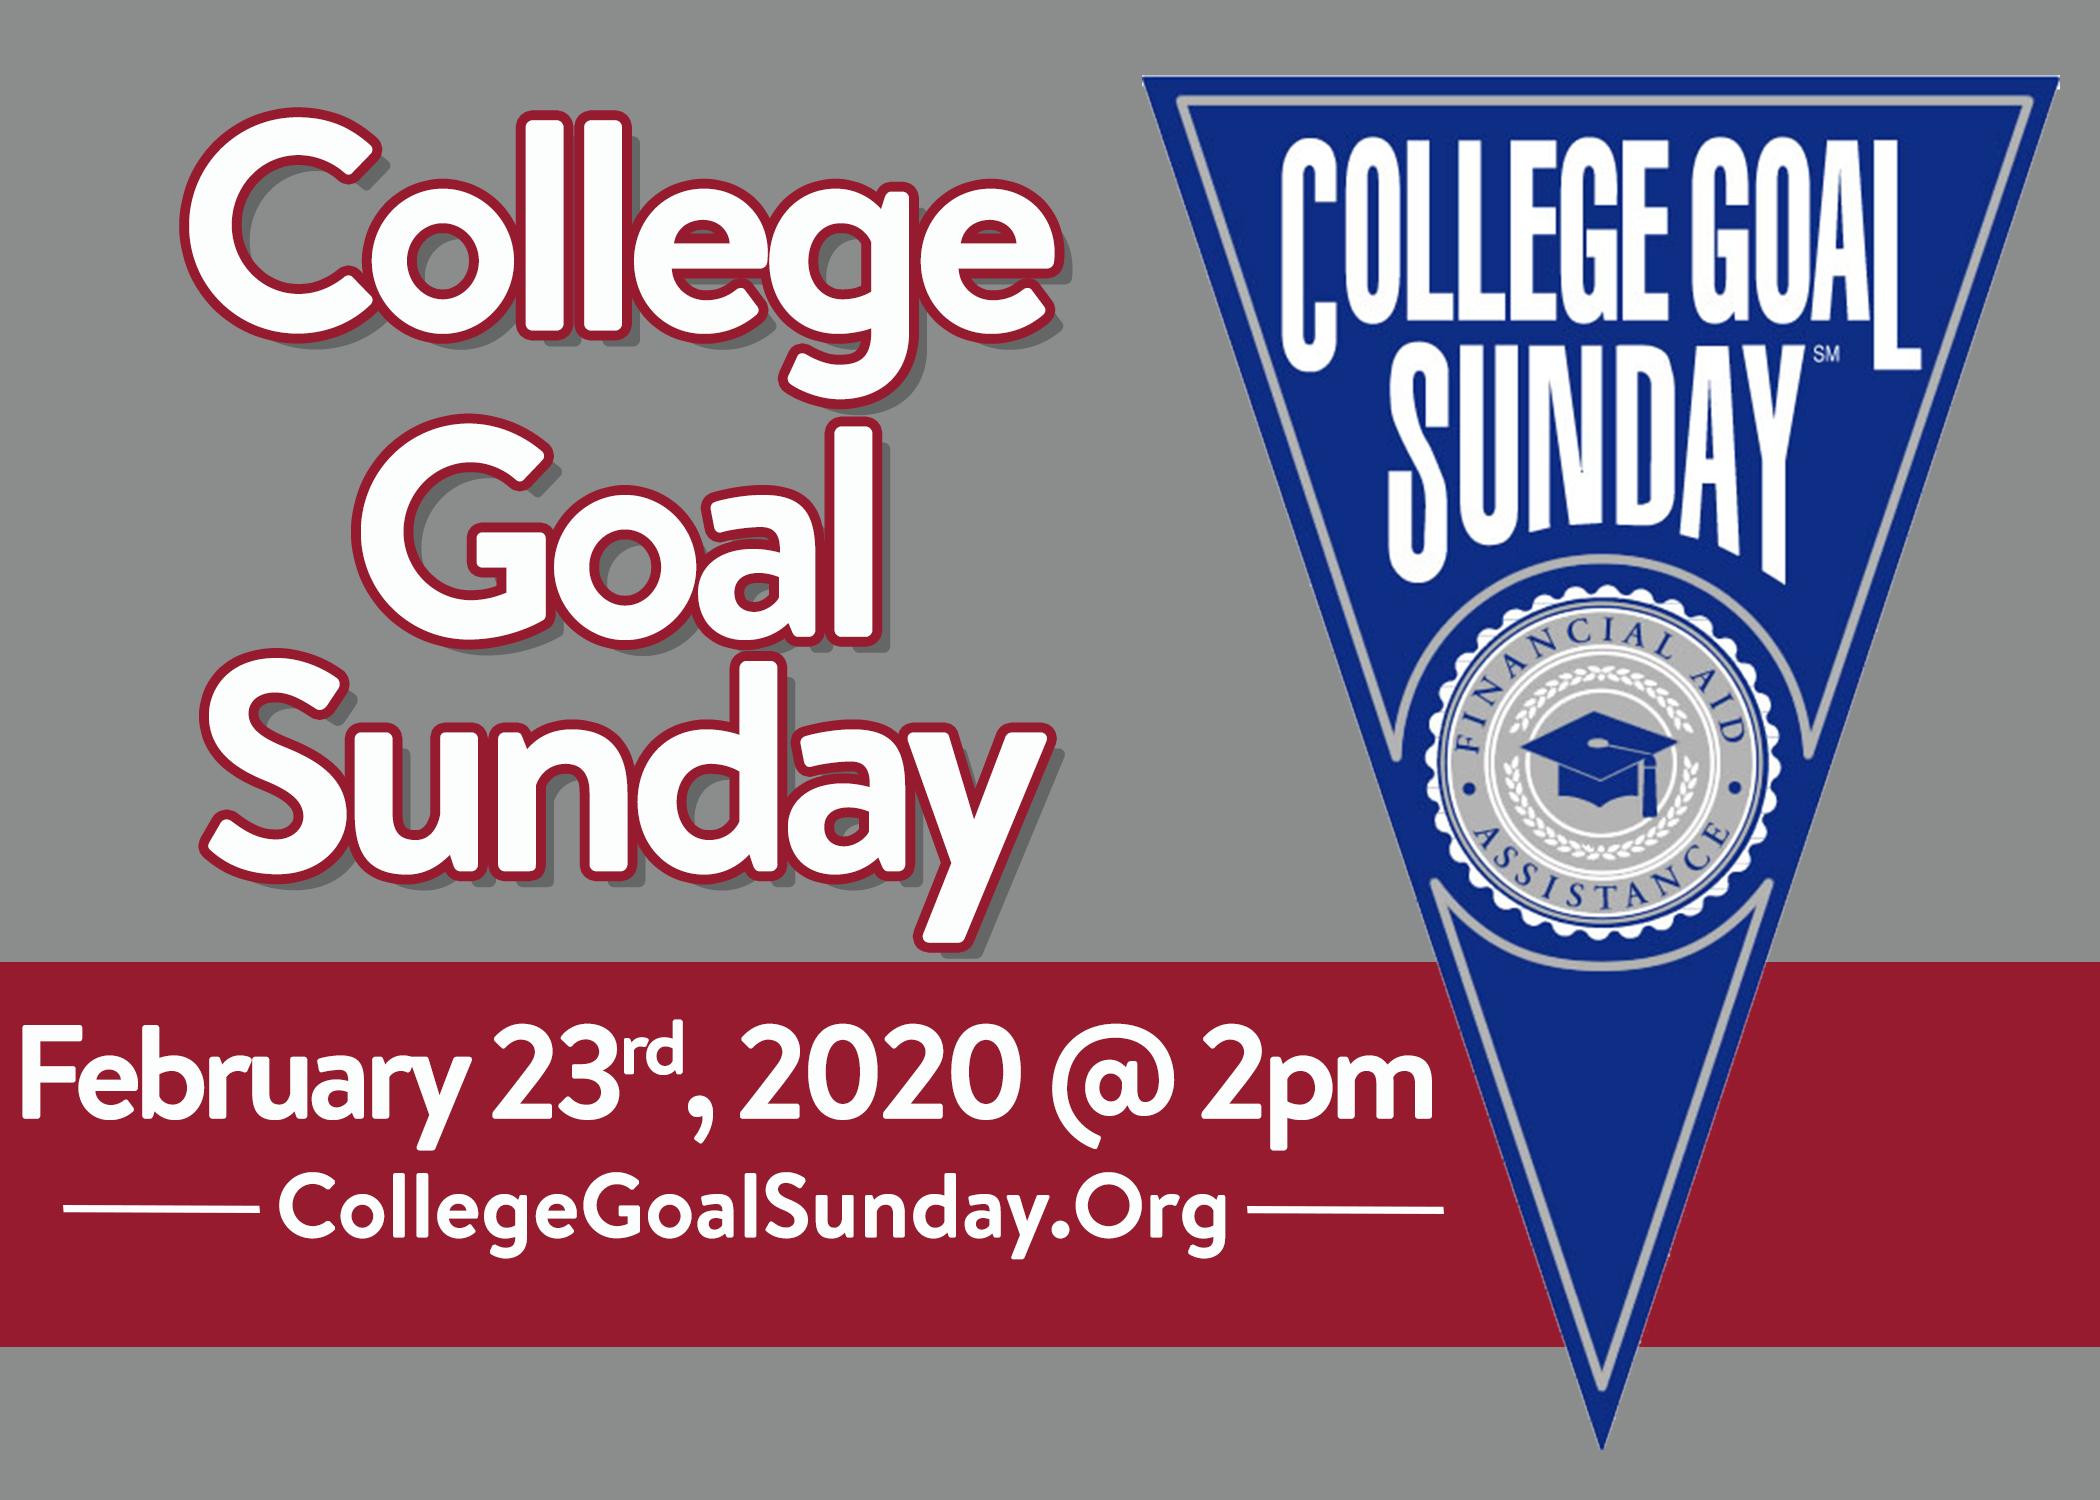 College Goal Sunday - Media Kit